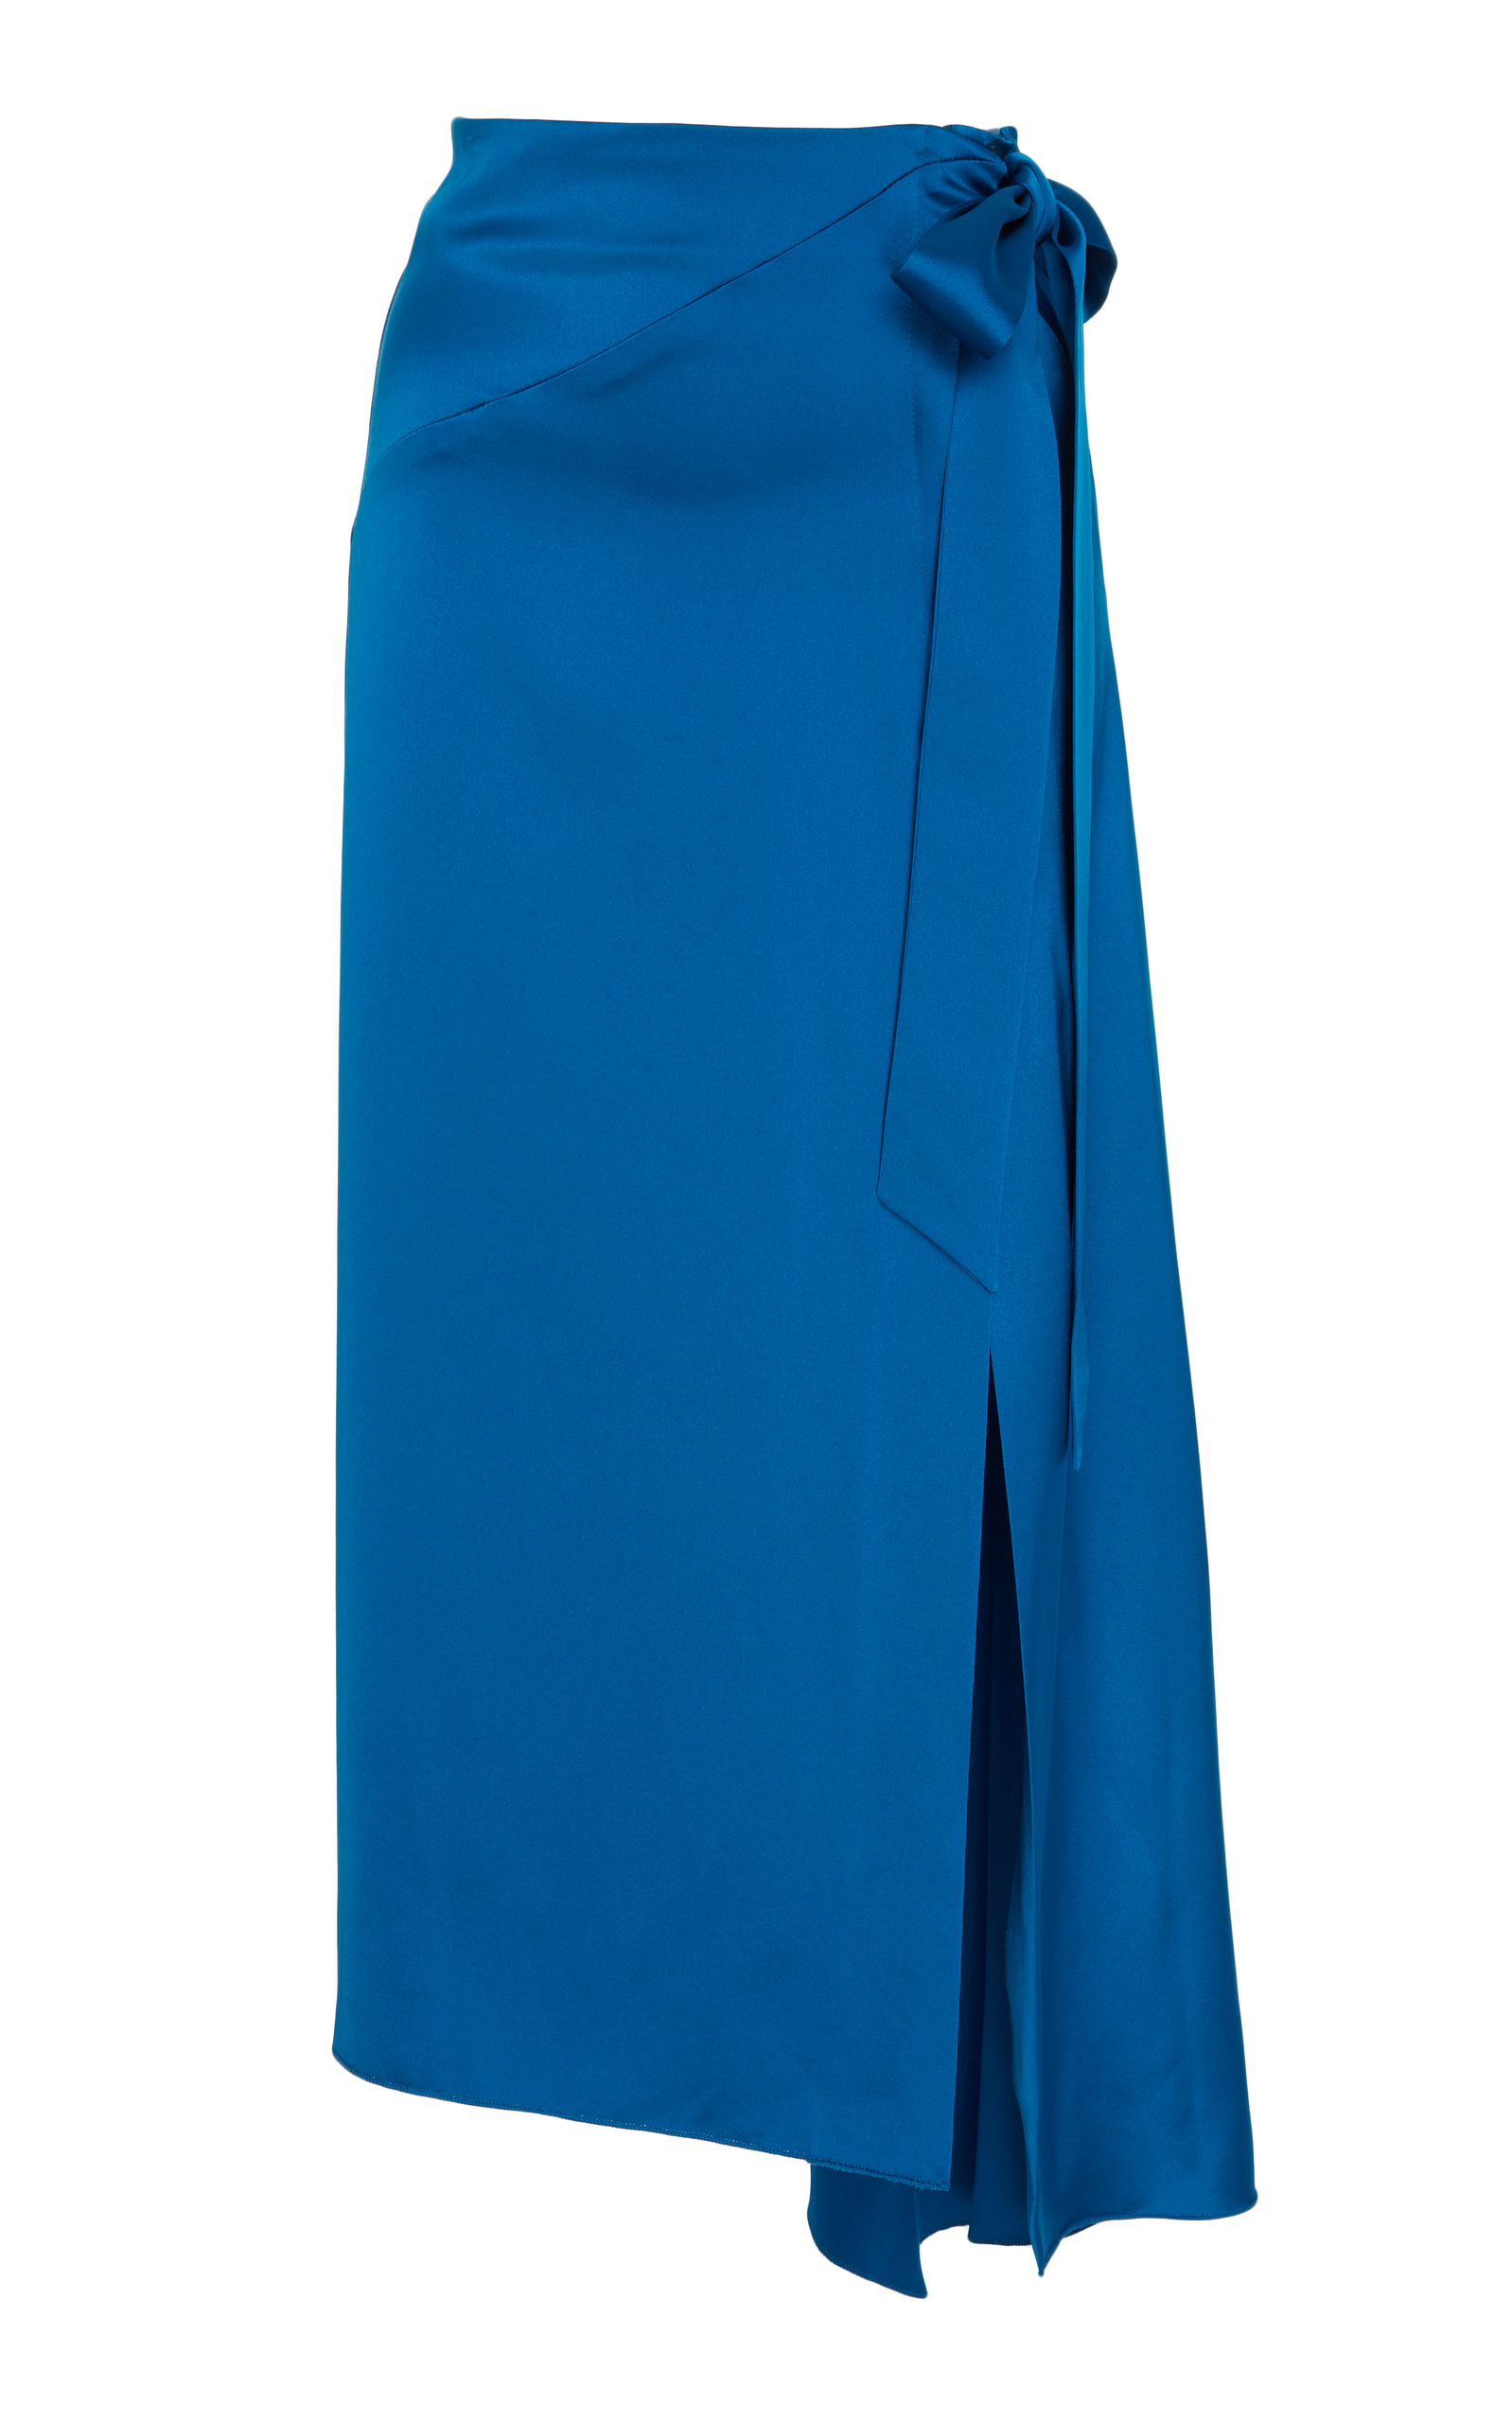 Wraparound Split Skirt